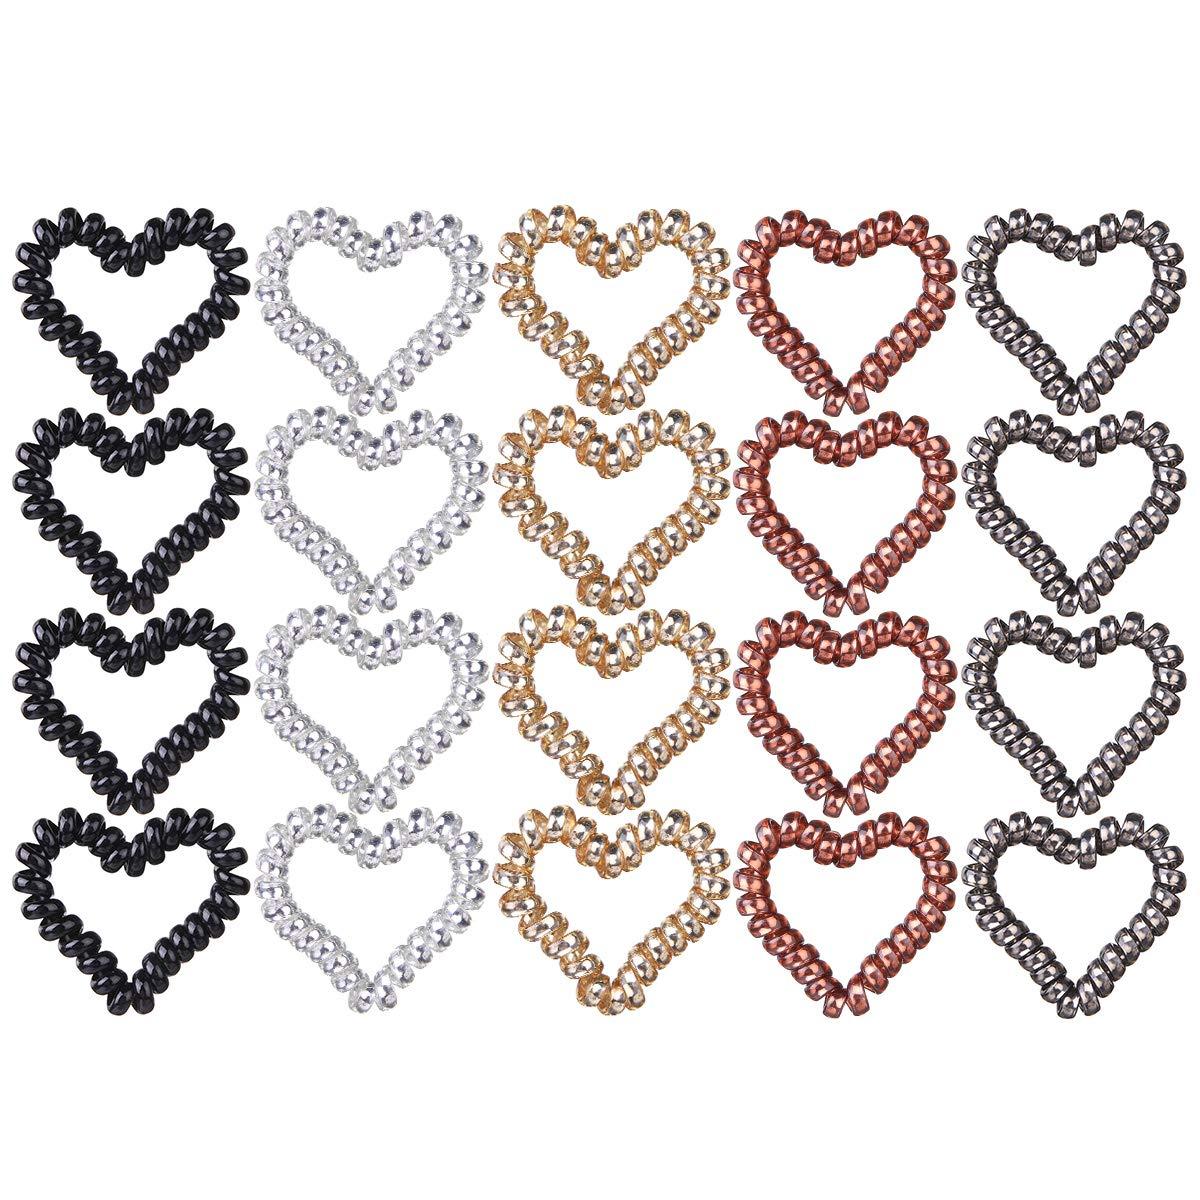 Heart foe inspired heart elastic heart hair ties heart favors-5//8